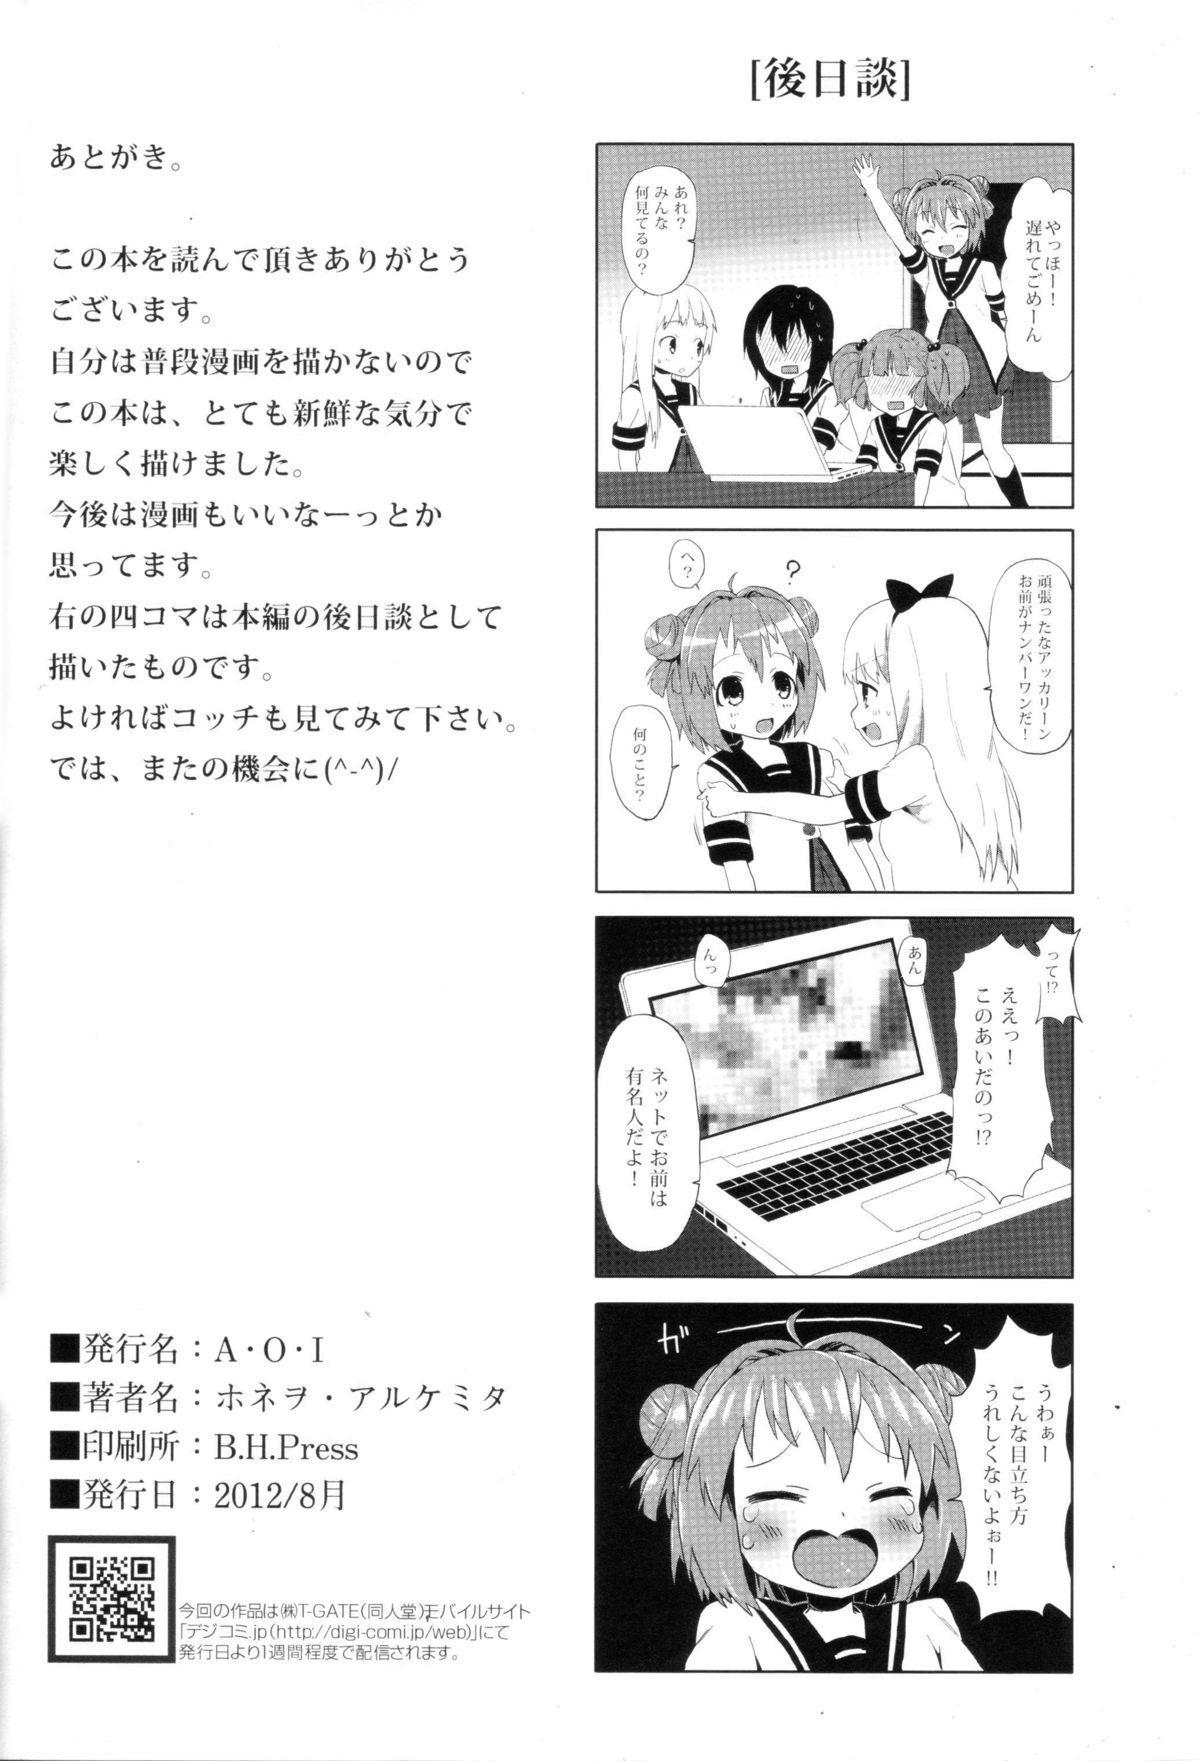 Akari wa Minna no Nikubenki 24